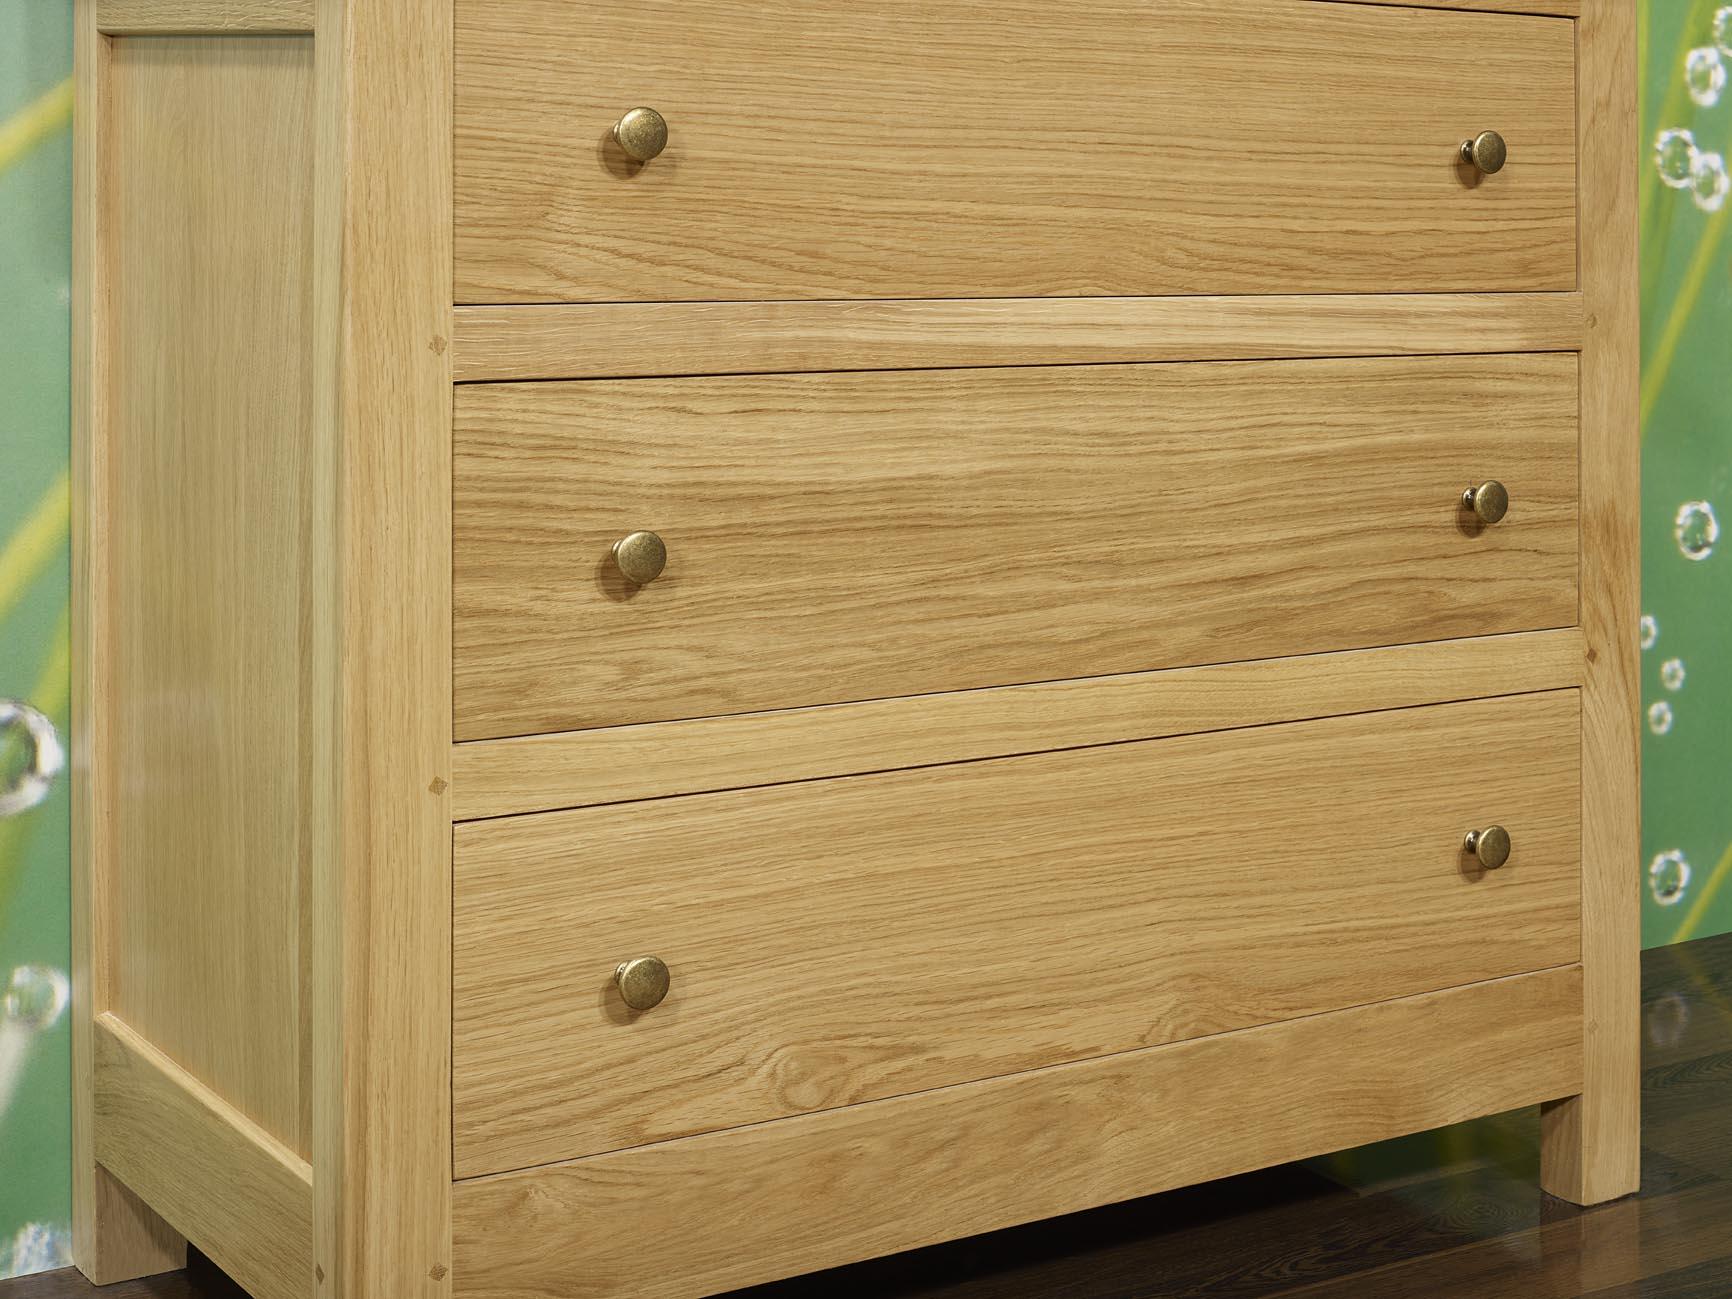 commode 3 tiroirs patrice en ch ne massif de stytle campagnard meuble en ch ne massif. Black Bedroom Furniture Sets. Home Design Ideas